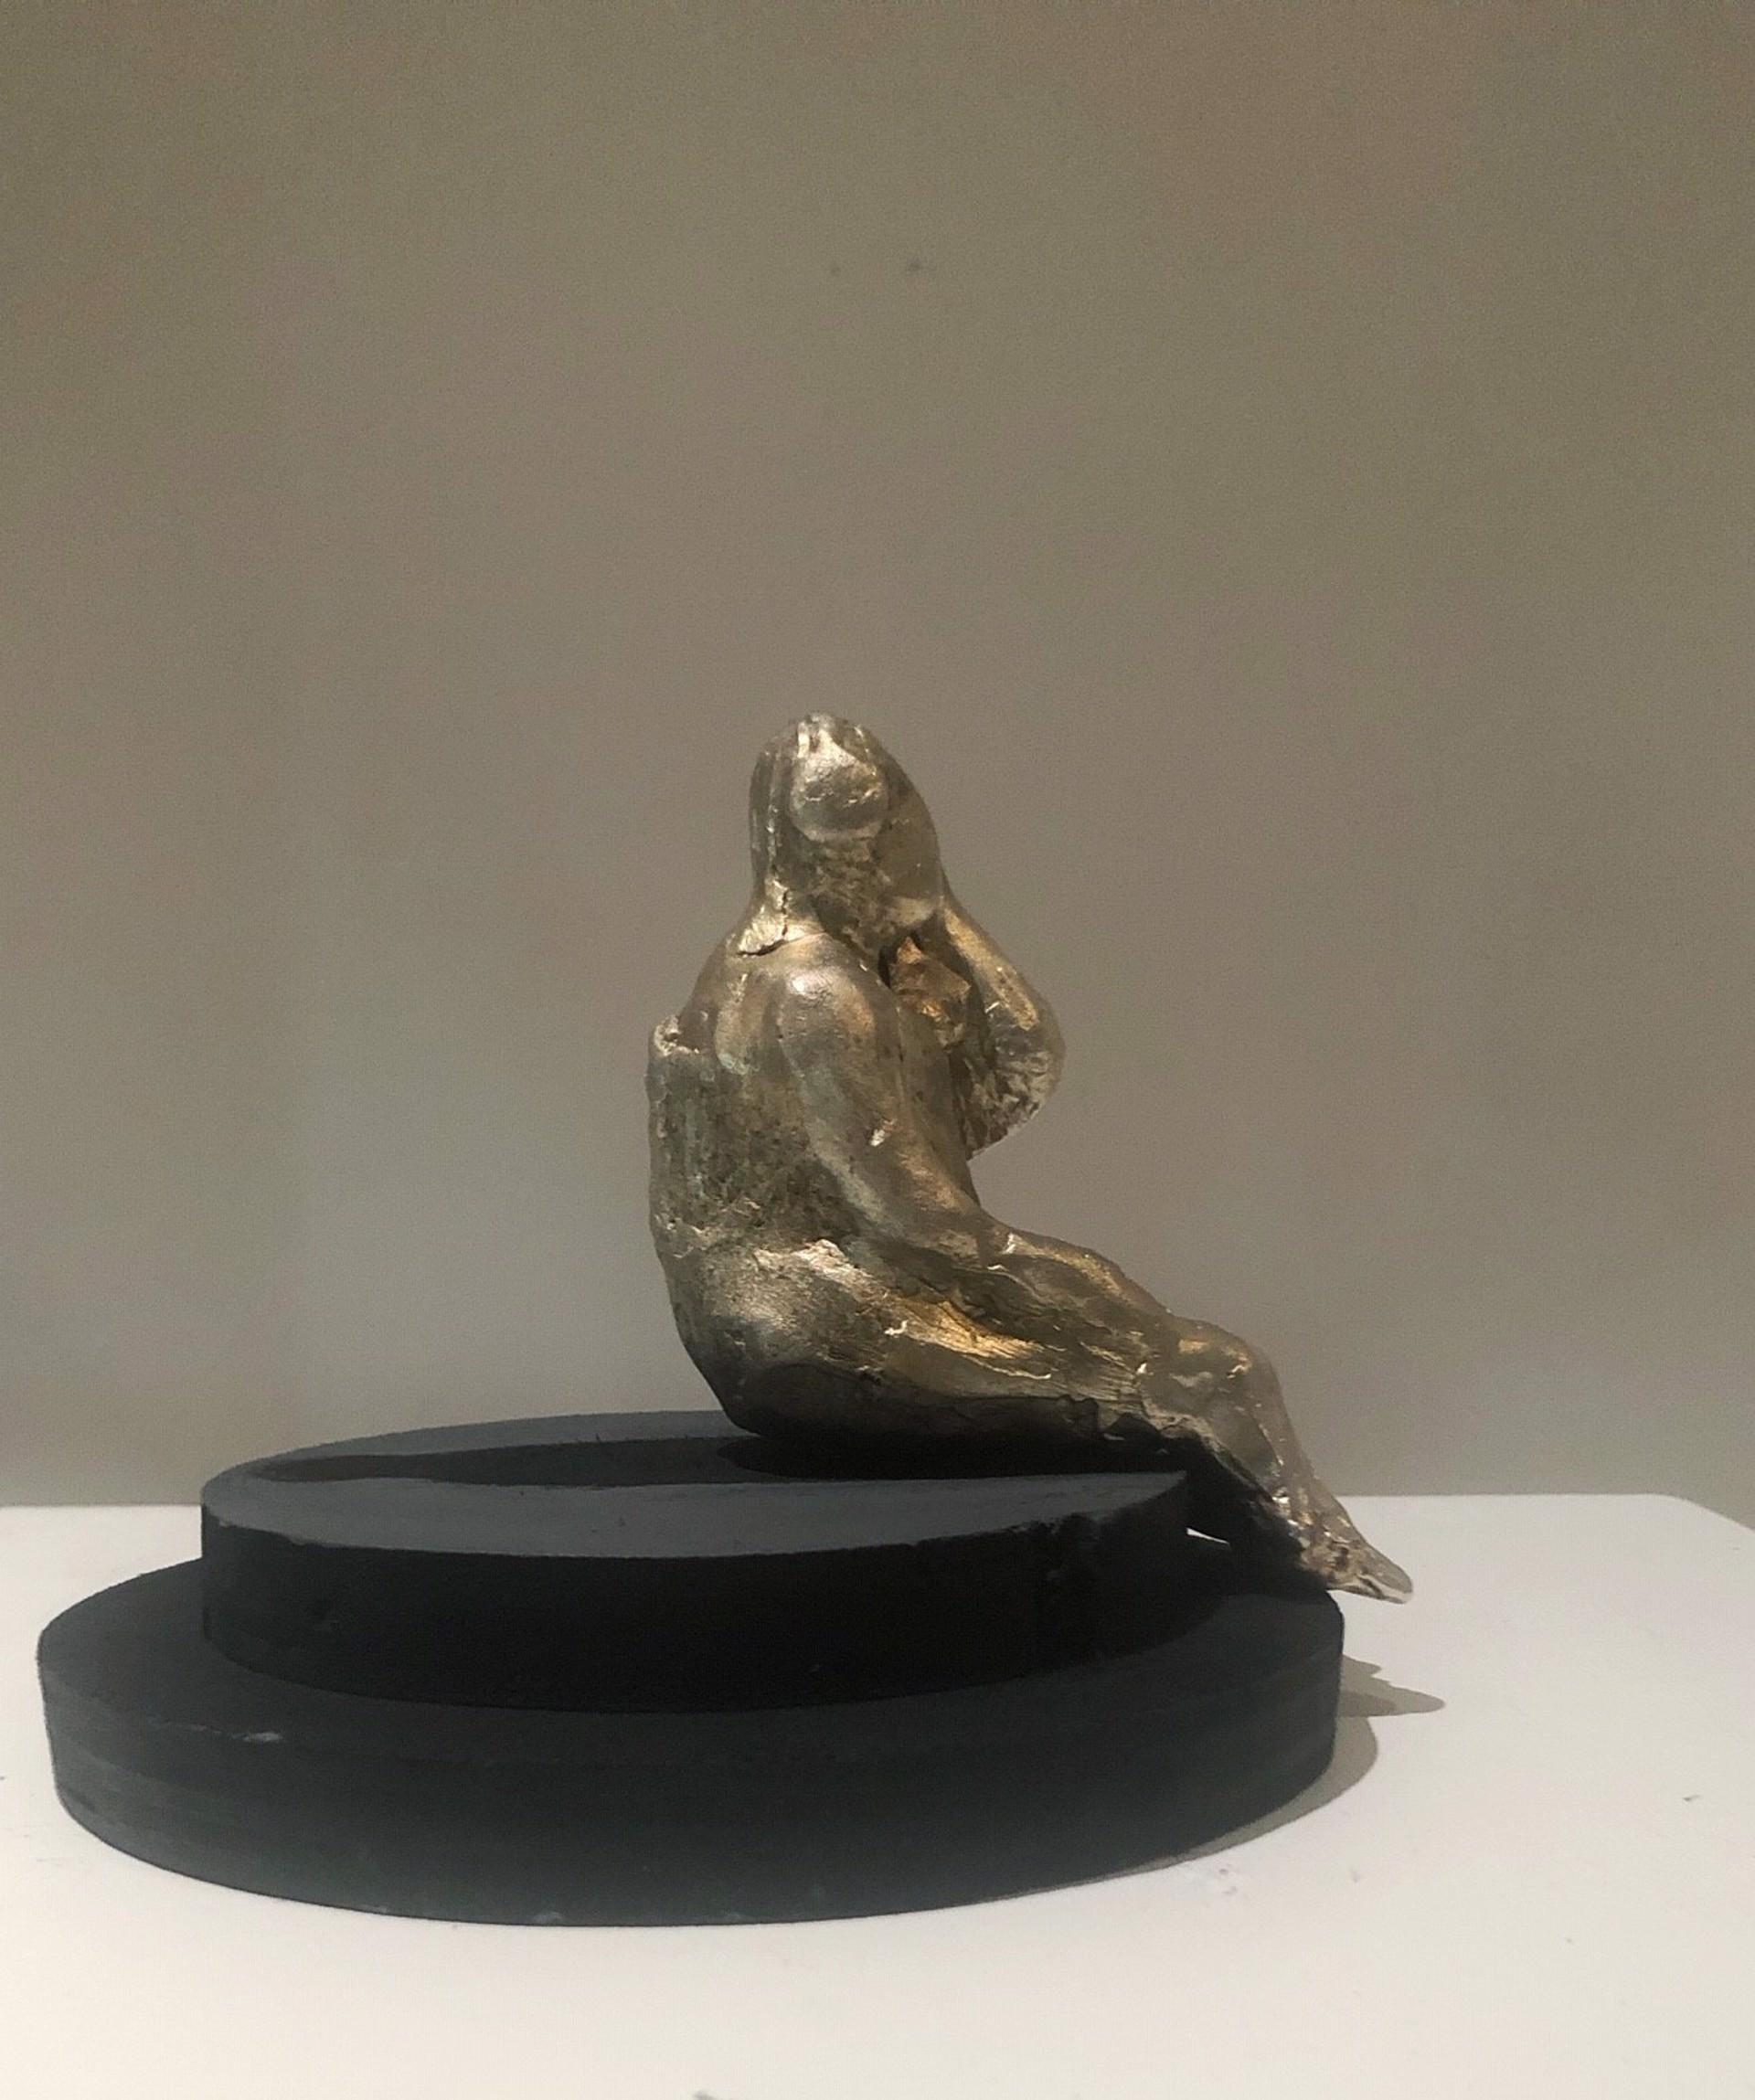 Spy Guy Gold by Marcus Jansen (b. 1968)